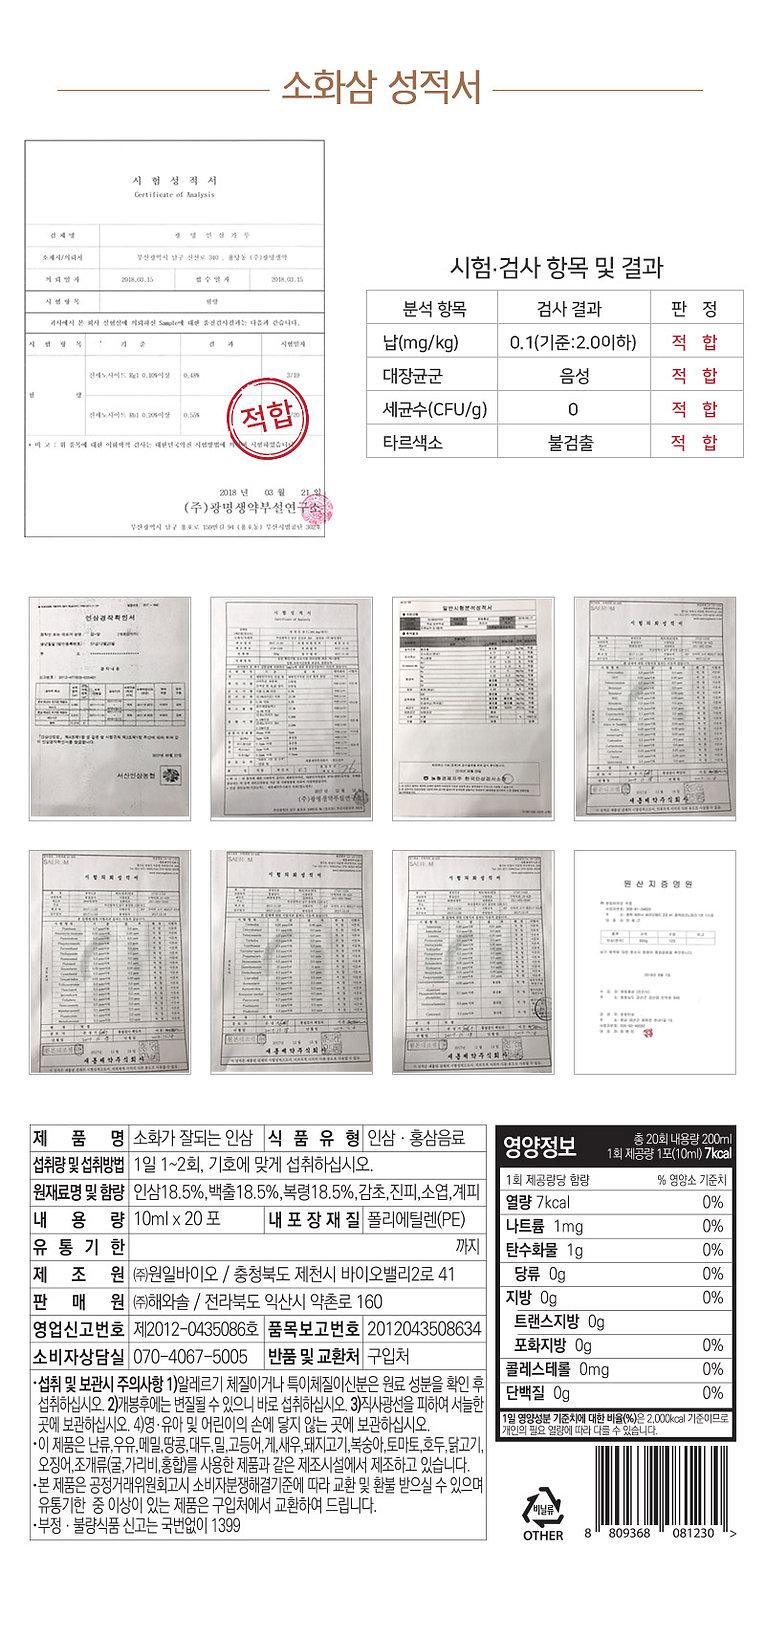 G_certificate.jpg